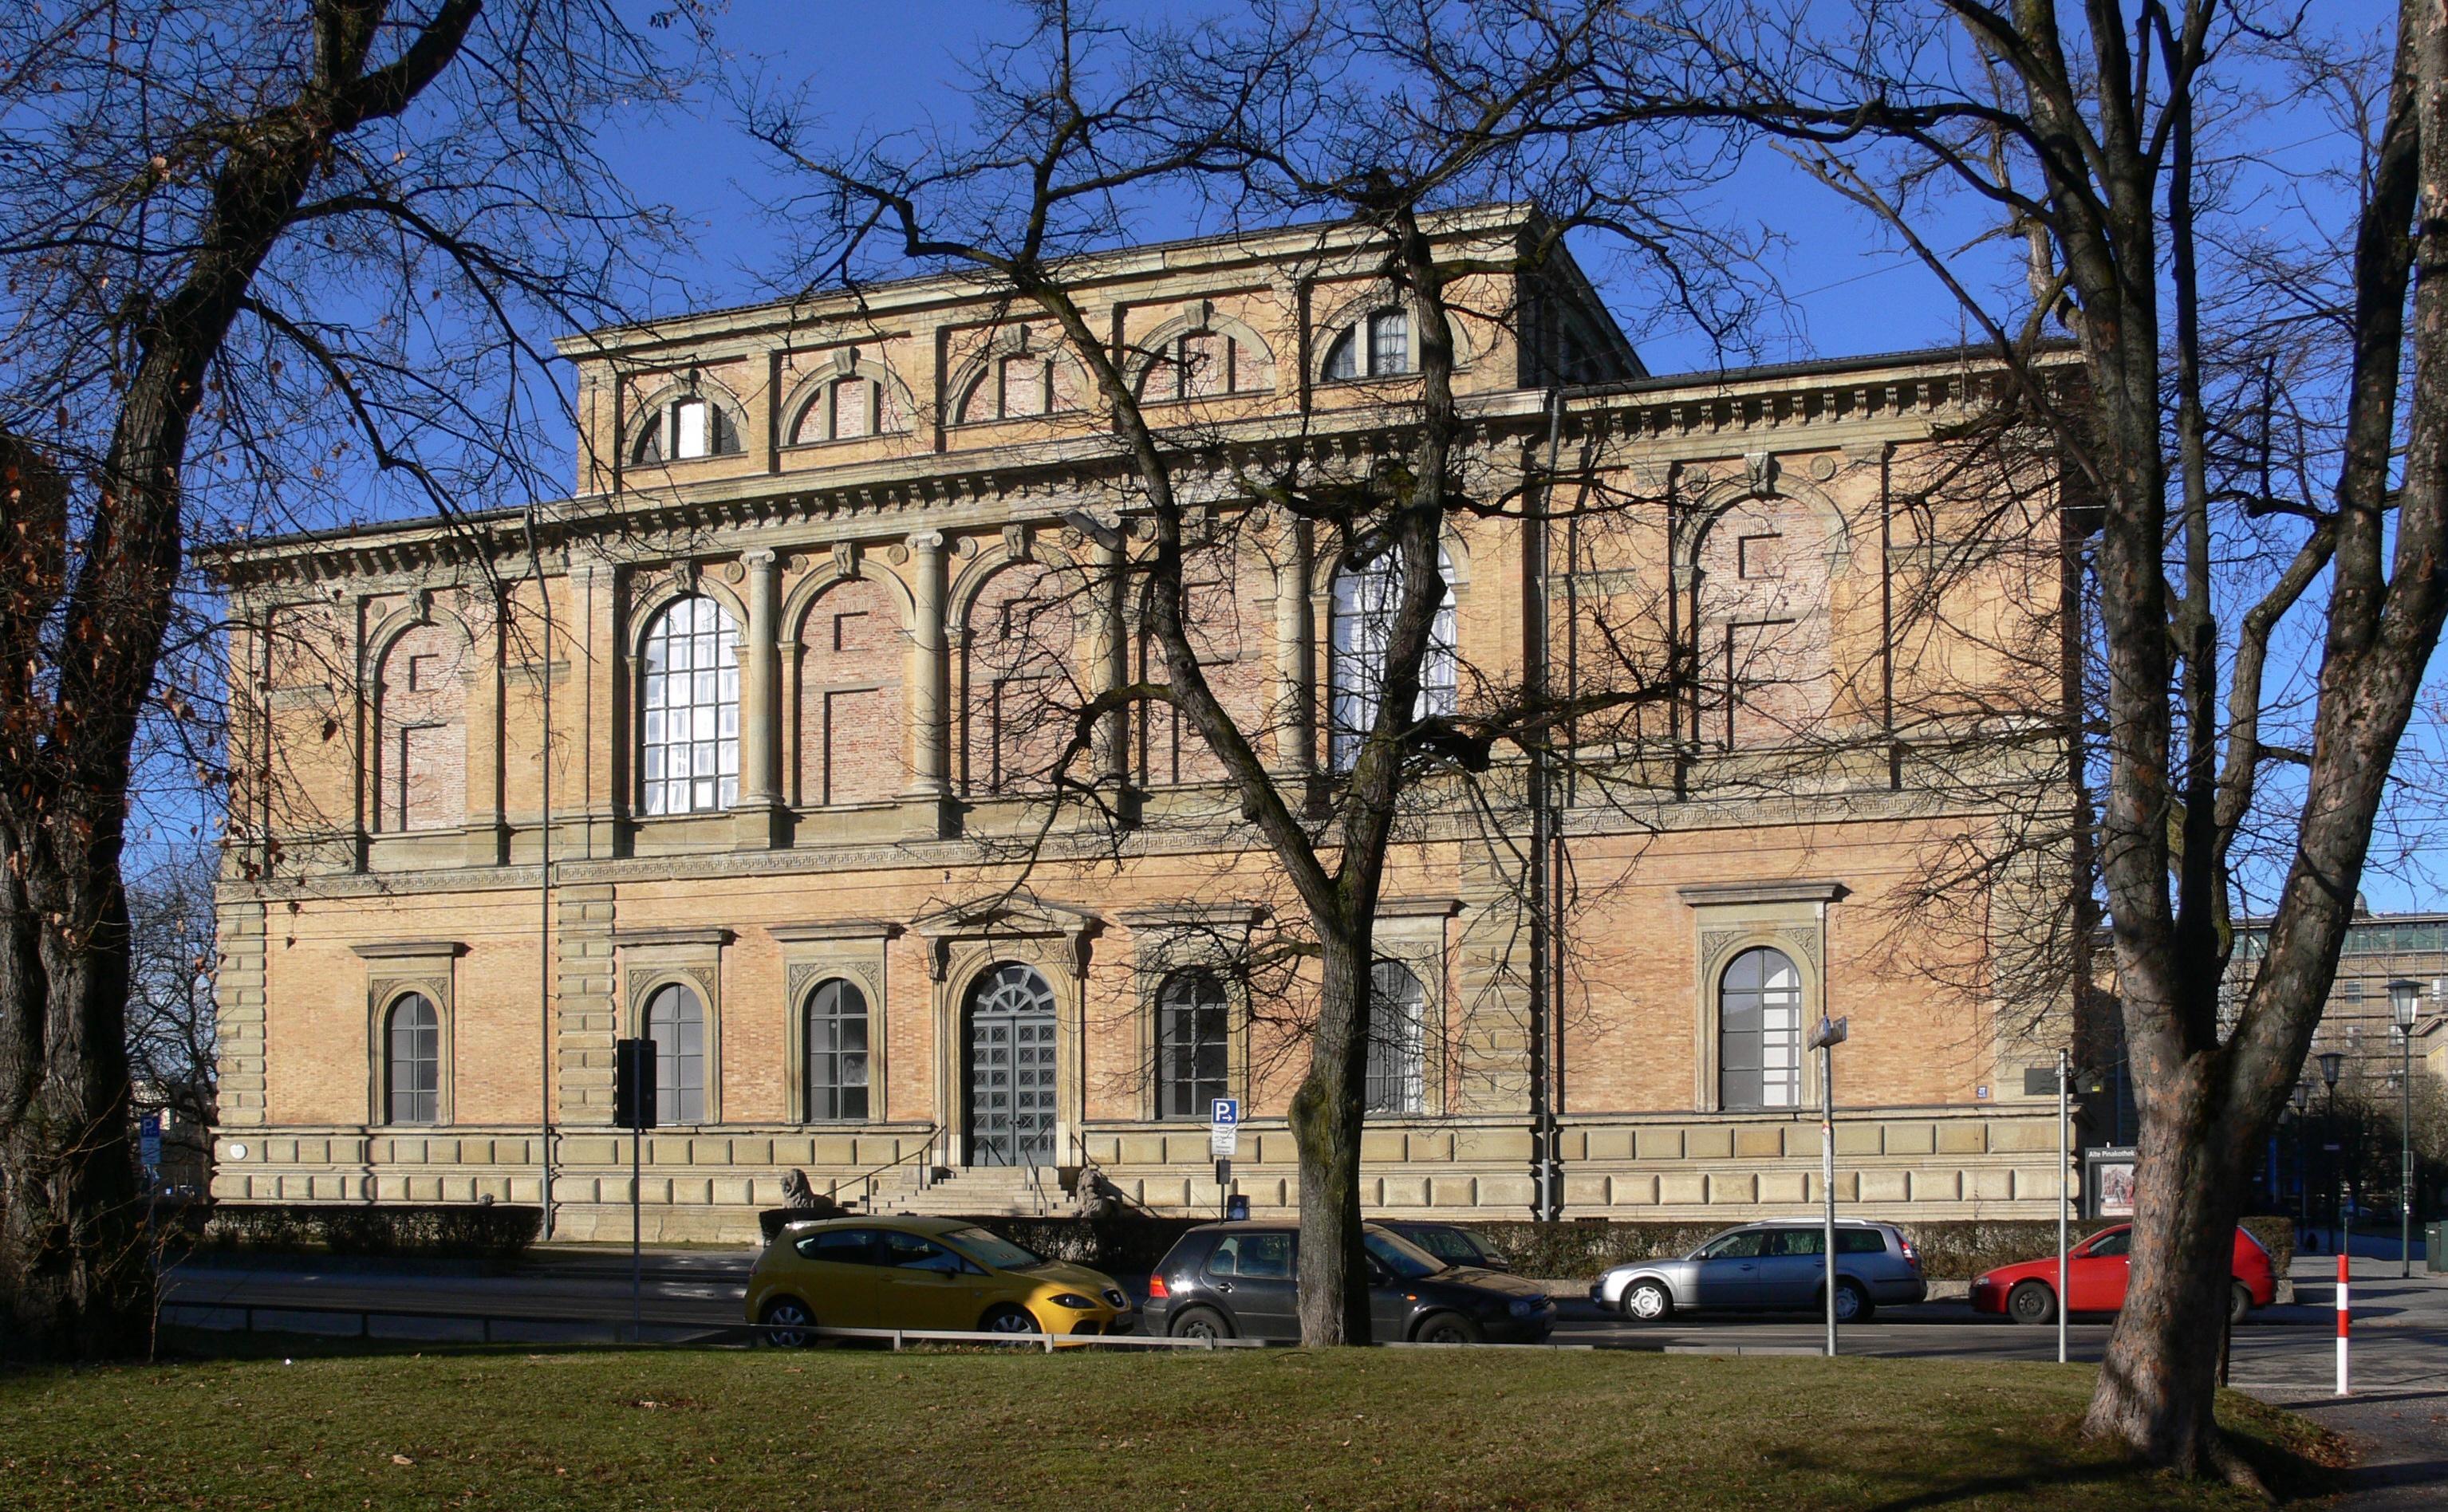 File:Alte Pinakothek 2009.jpg - Wikimedia Commons